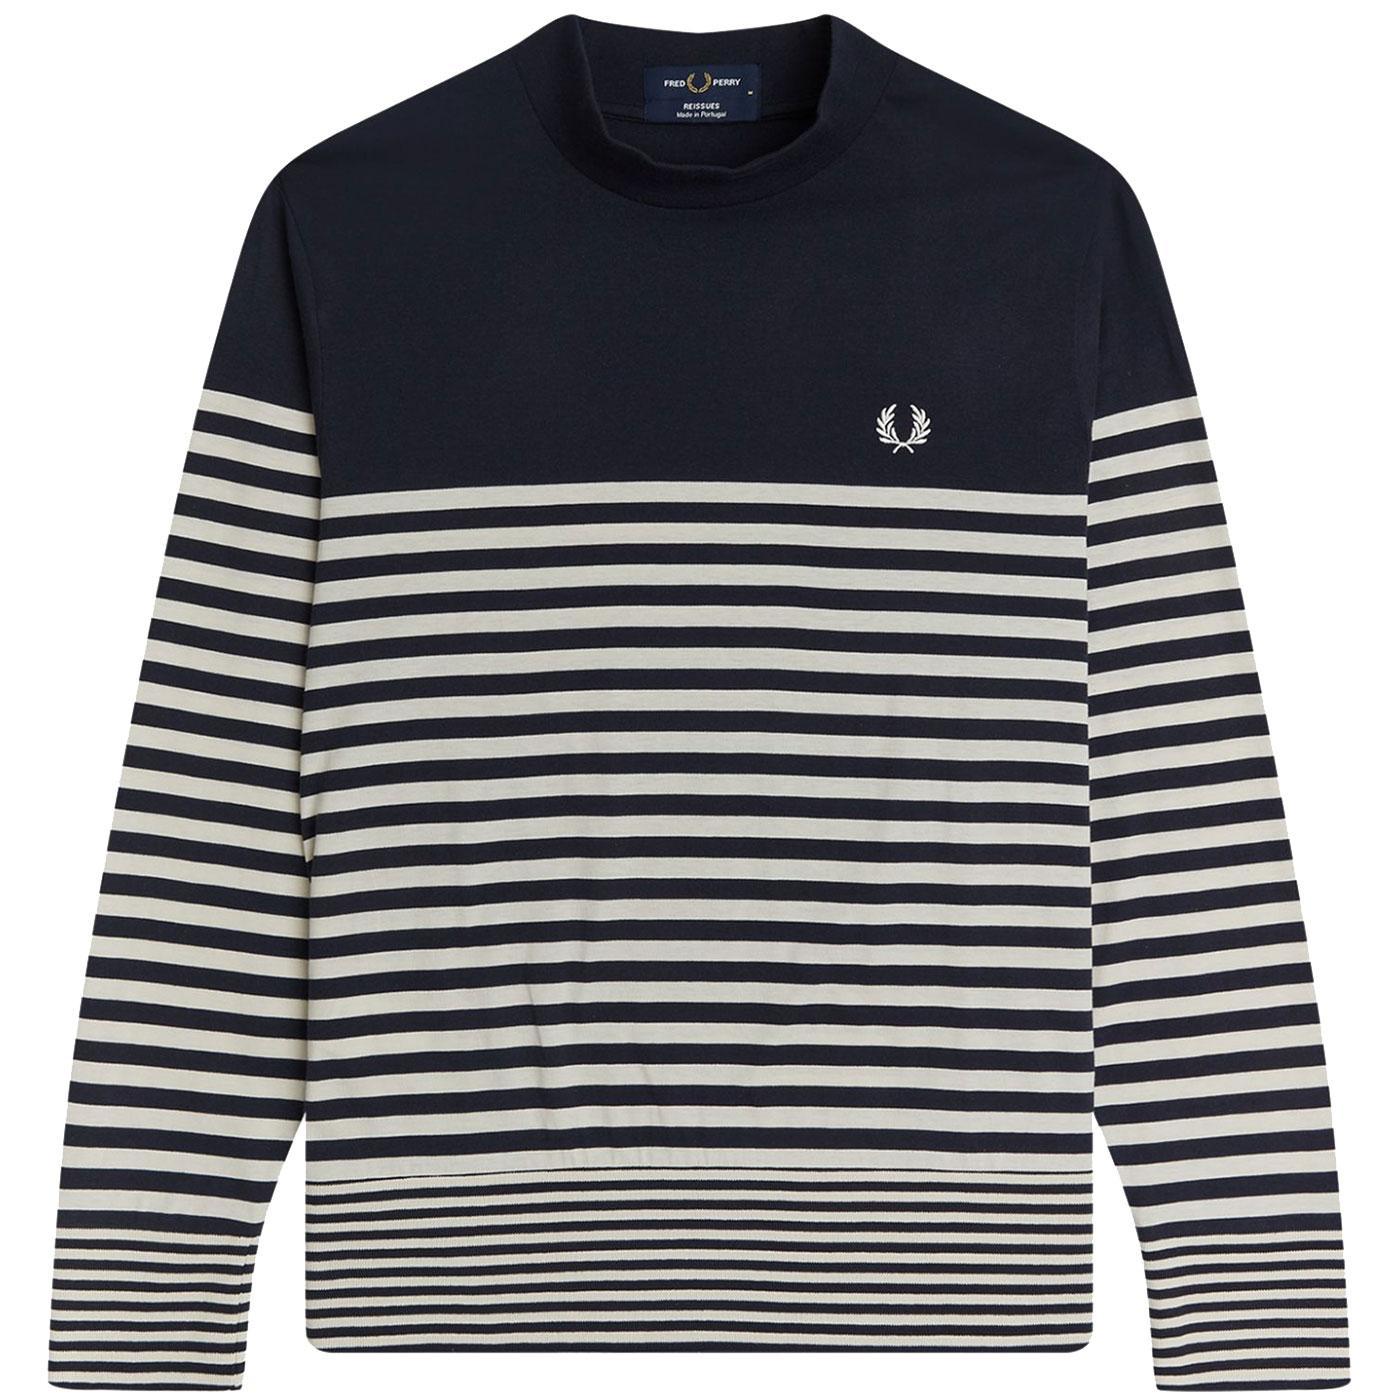 FRED PERRY Mod Breton Stripe Turtleneck Sweater